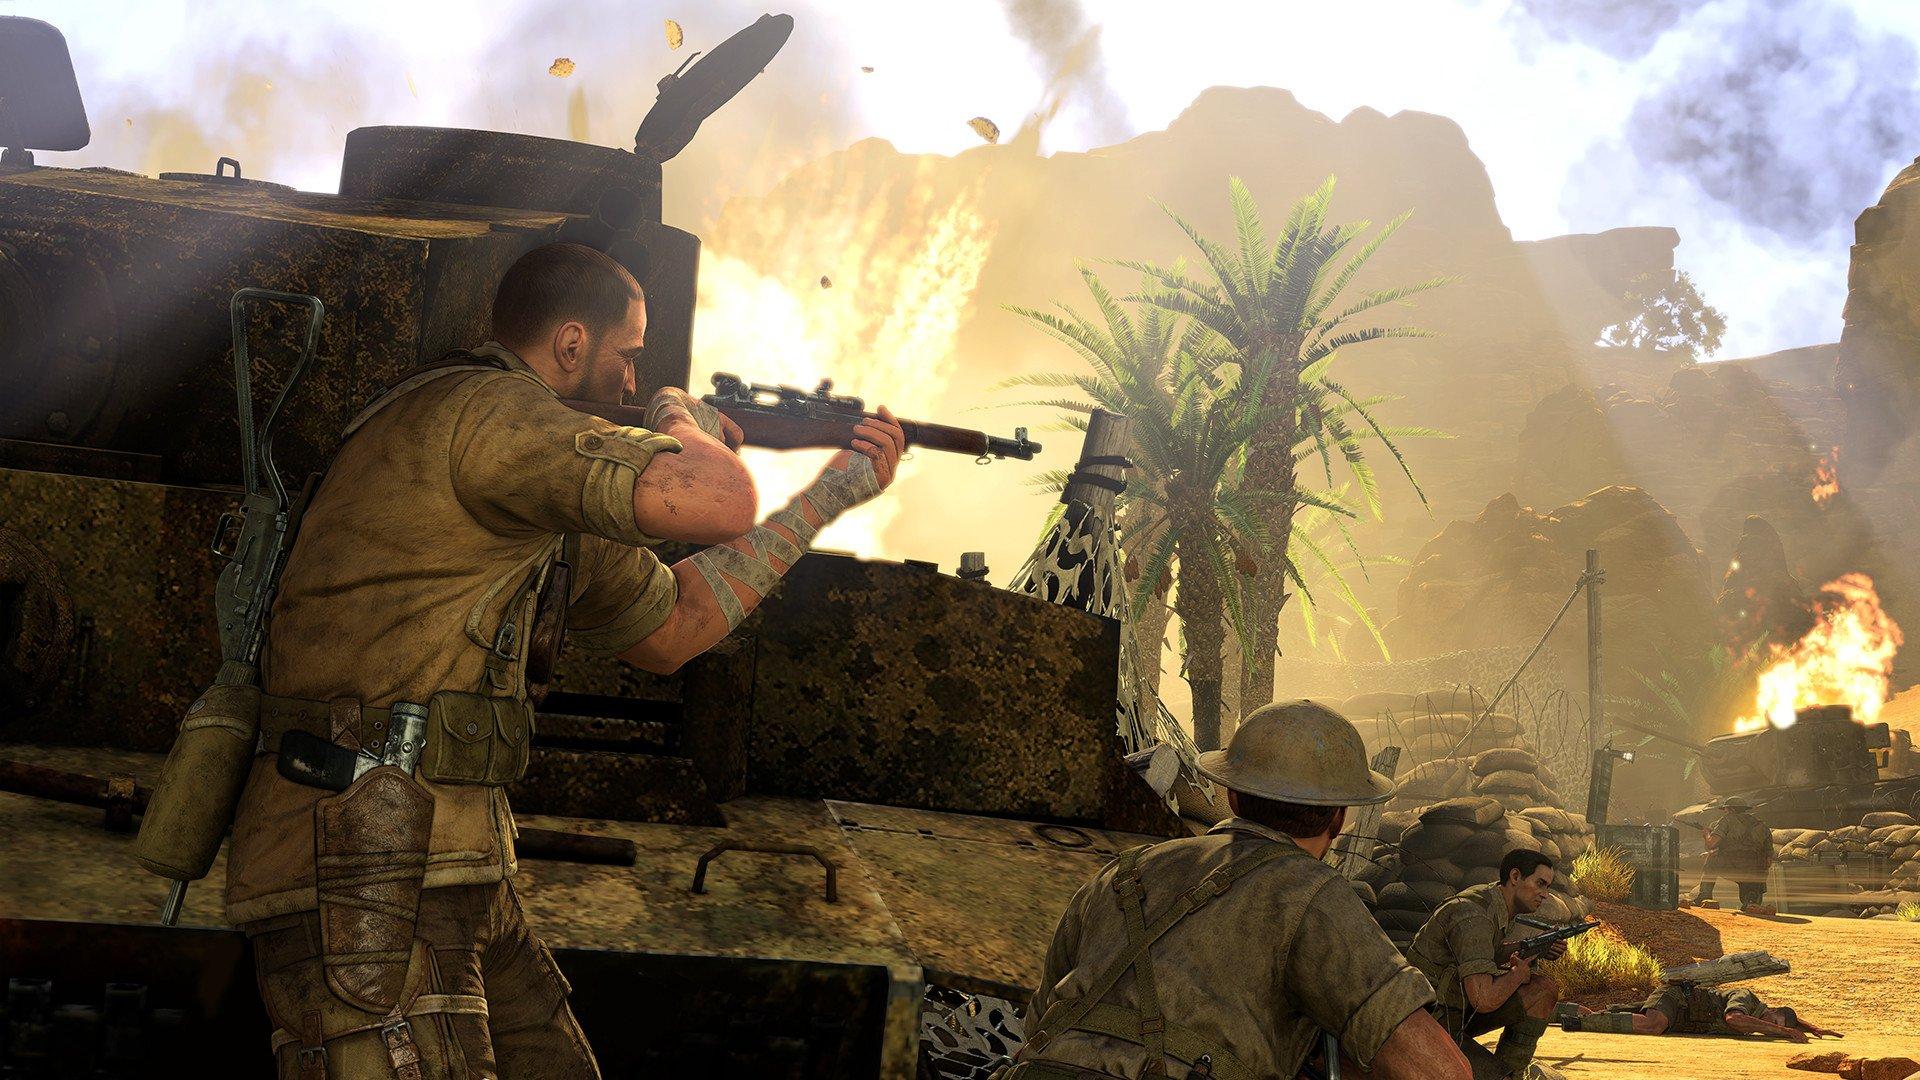 sniper elite 3 2537599 تصاویر جدیدی از Sniper Elite 3 منتشر شد : بیابان گردی در آفریقا